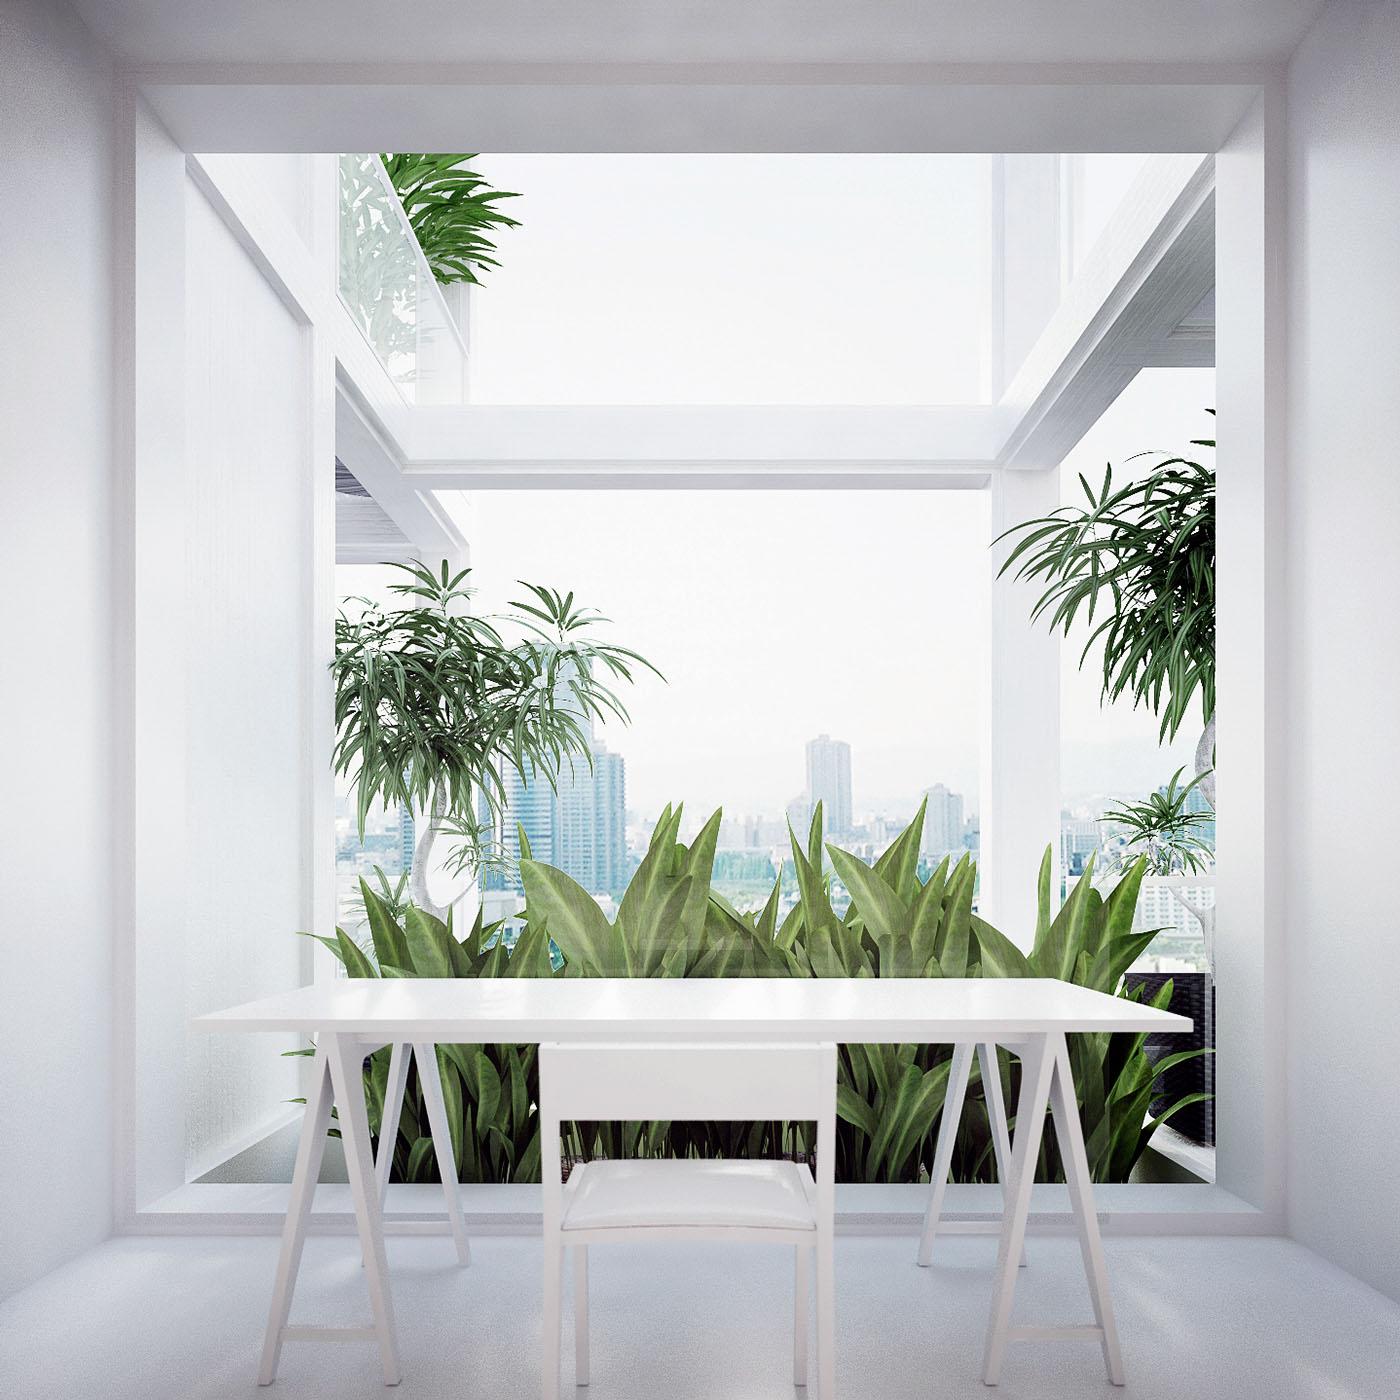 Vijayawada Garden Estate - table with chairs